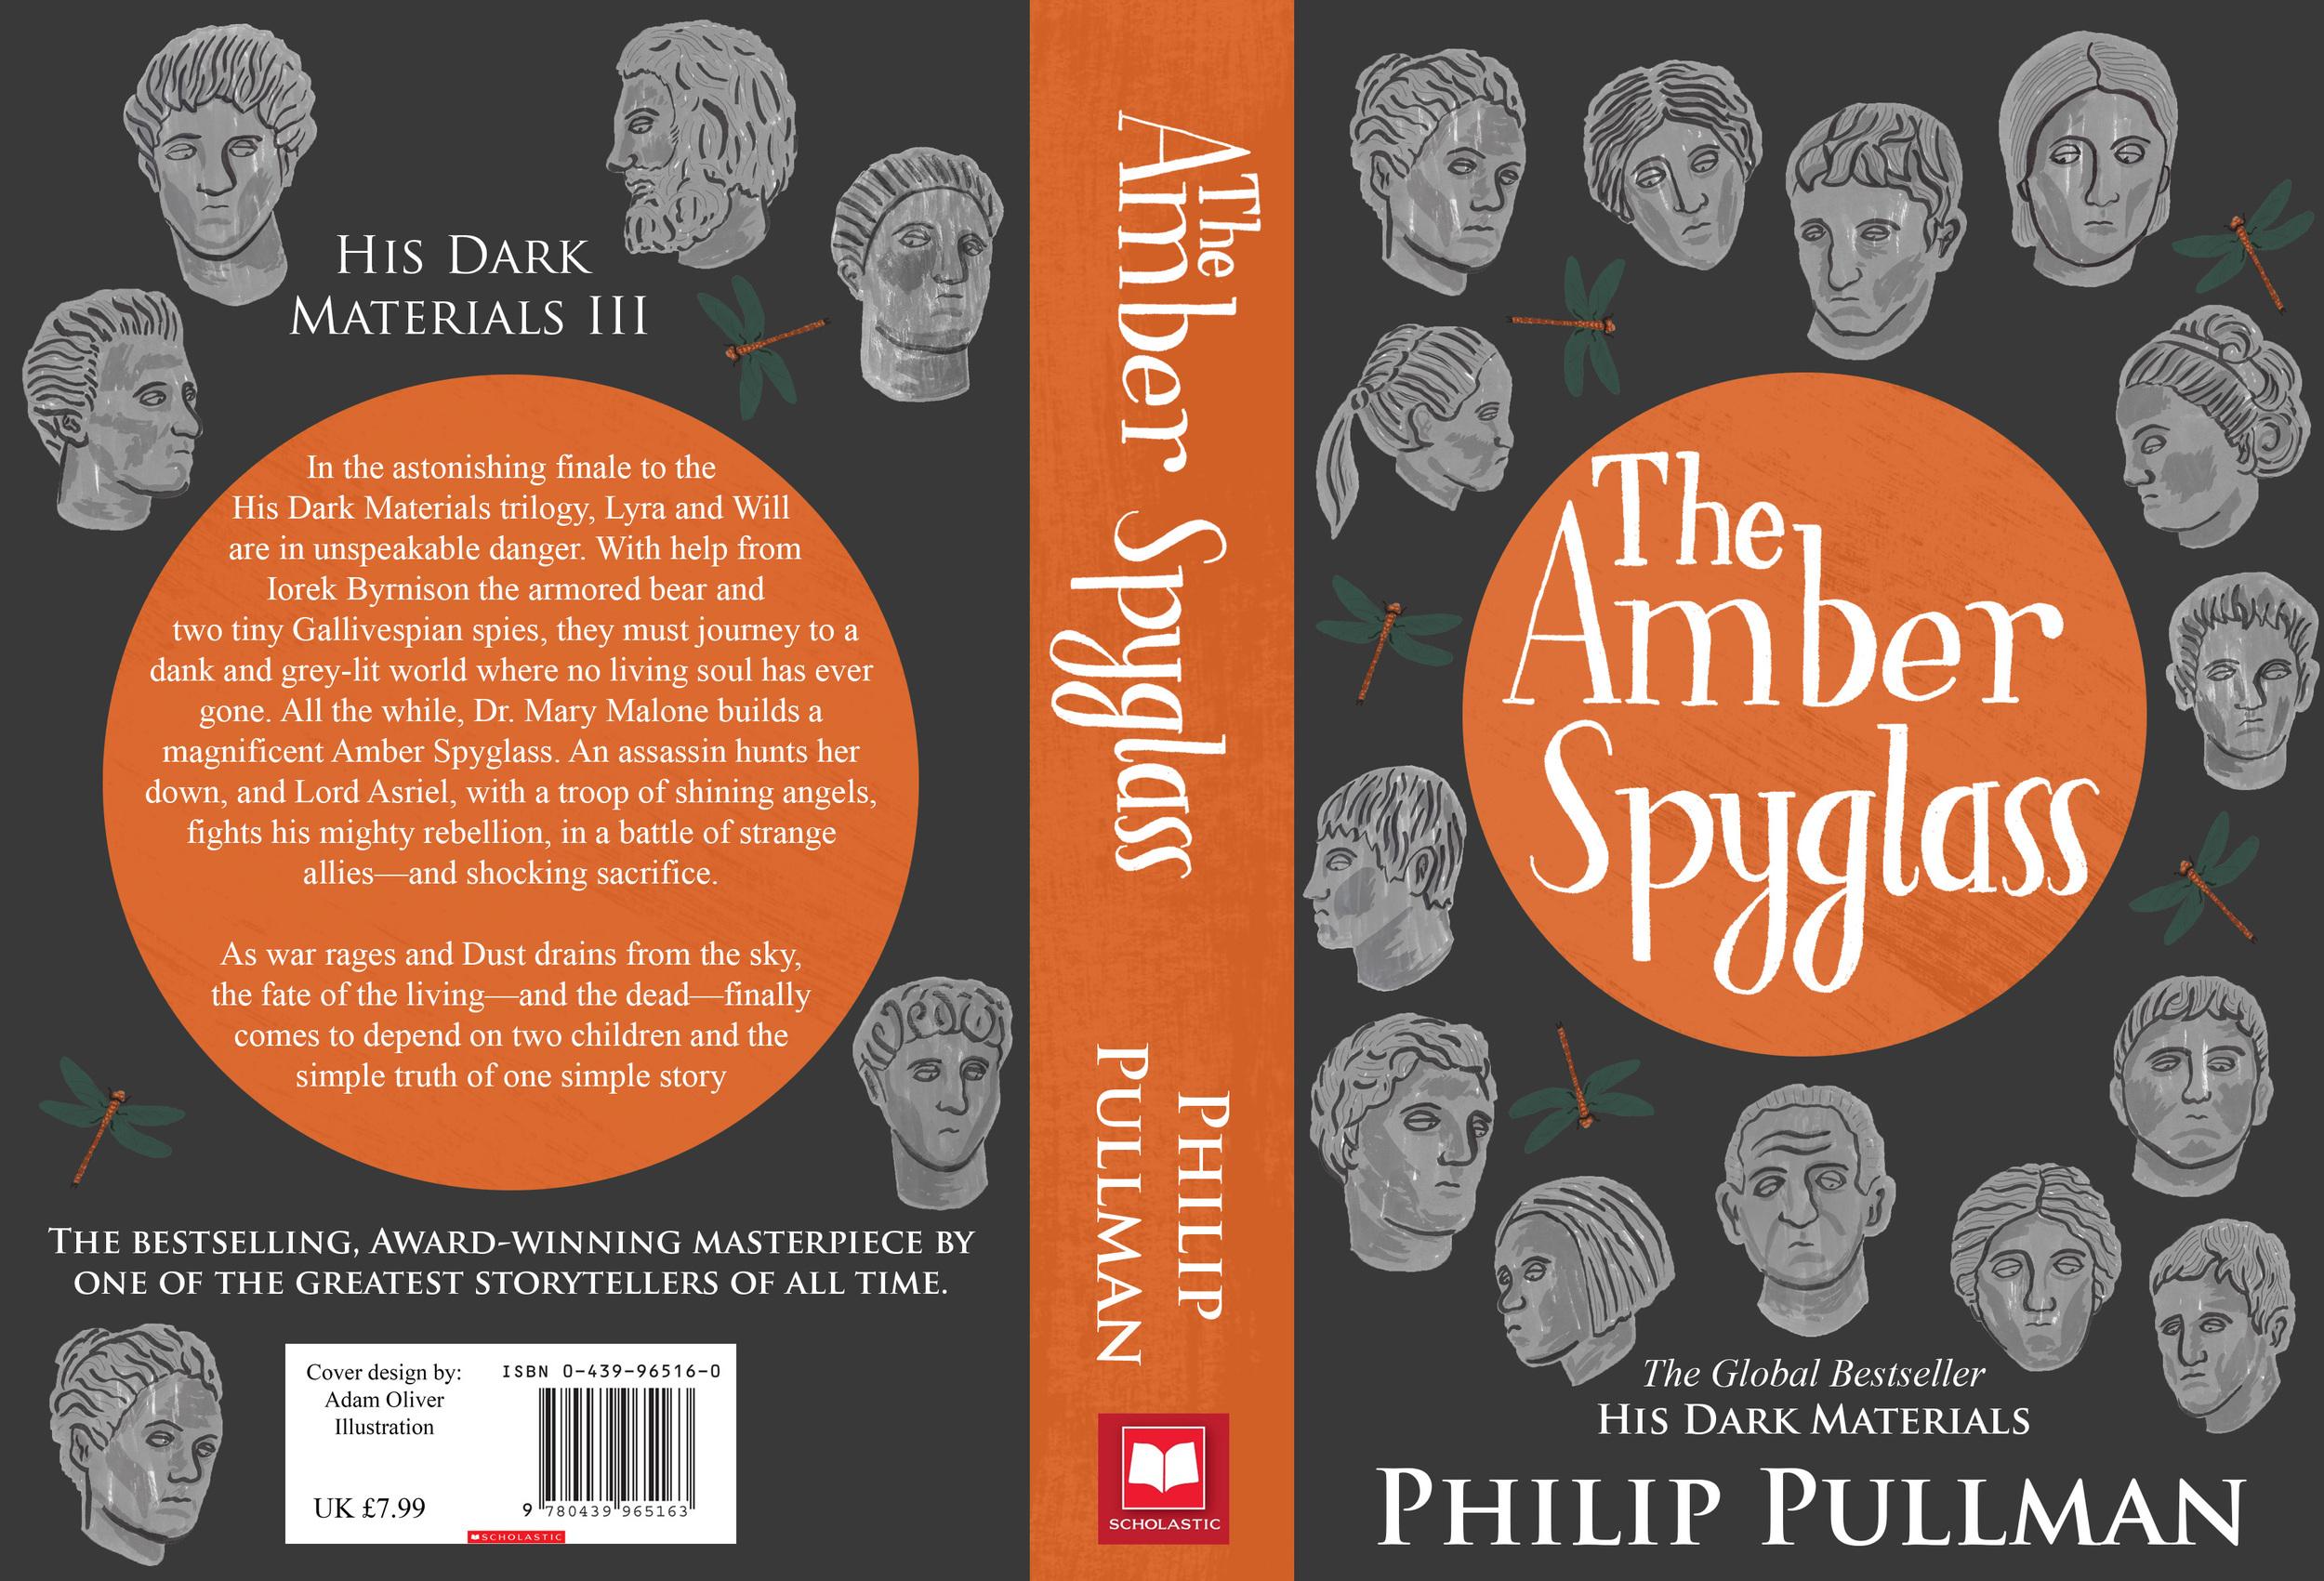 Book three - The Amber Spyglass